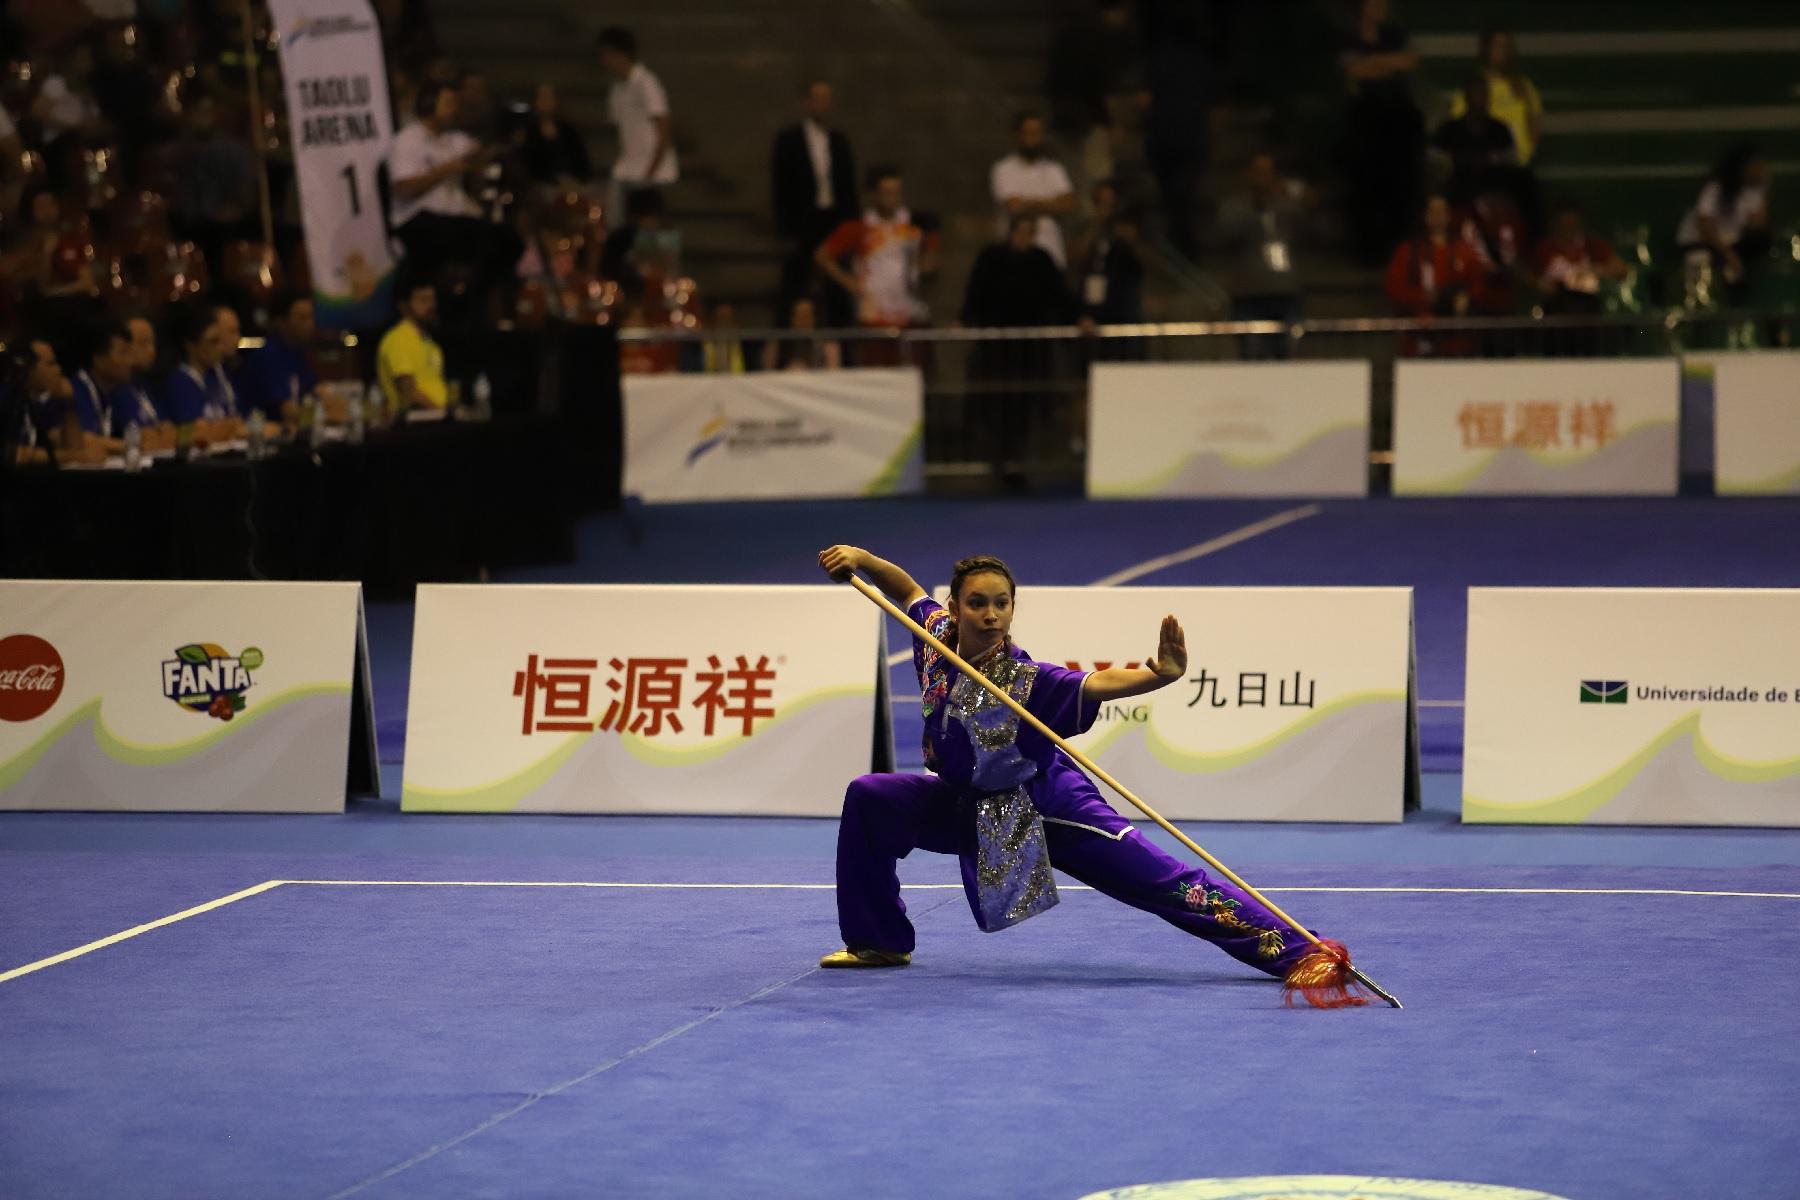 wayland-li-wushu-brazil-world-junior-wushu-championships-2018-team-canada-32.jpg